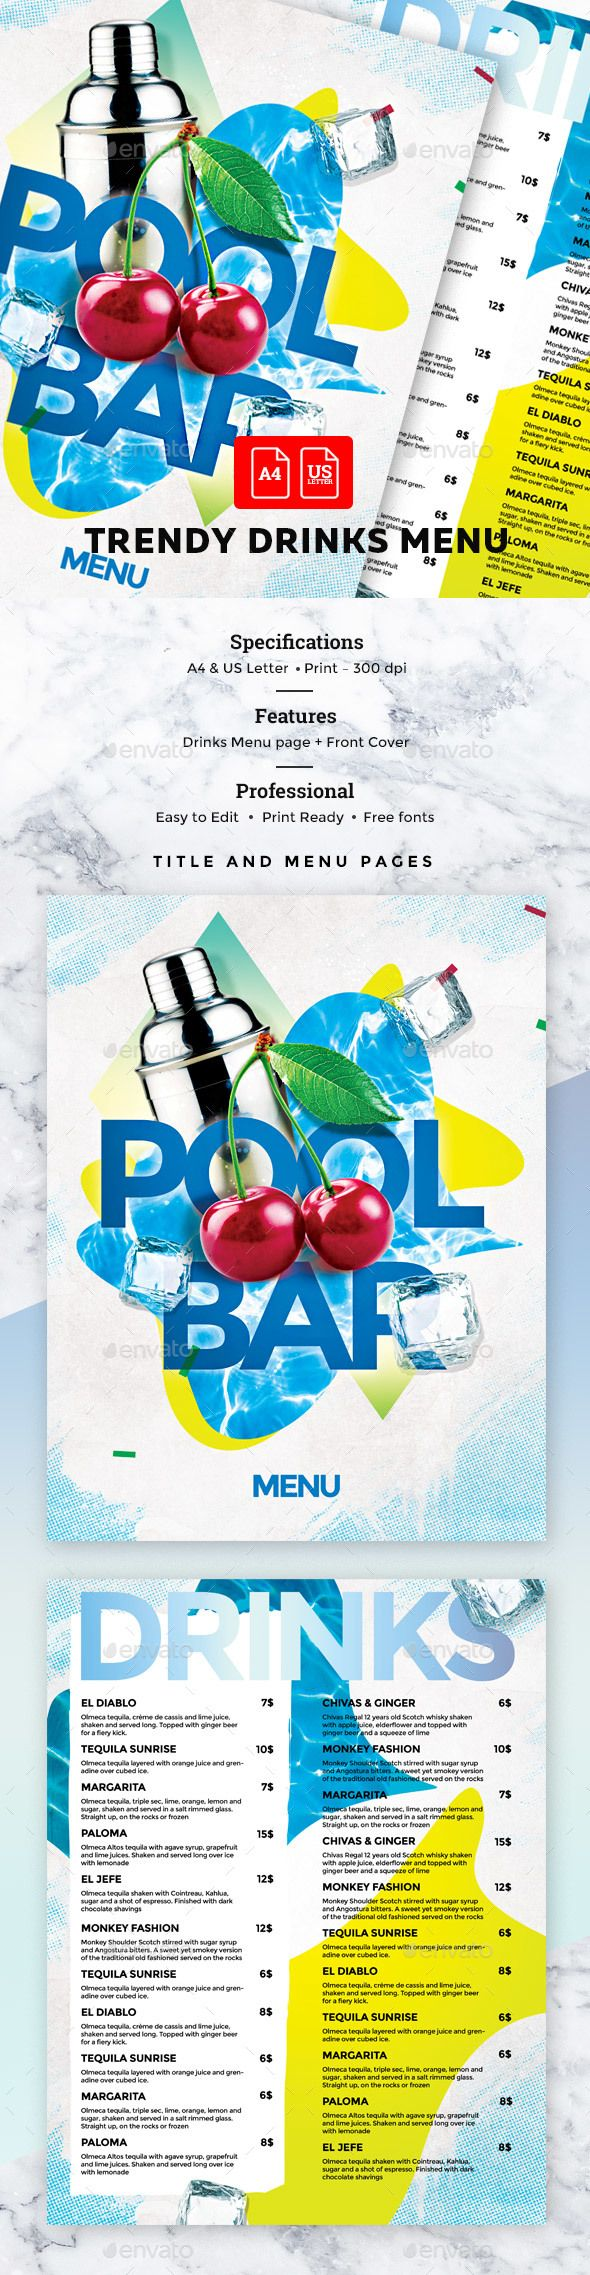 Cocktail Drinks #Menu - #Food Menus Print Templates Download here: https://graphicriver.net/item/cocktail-drinks-menu/19715367?ref=alena994